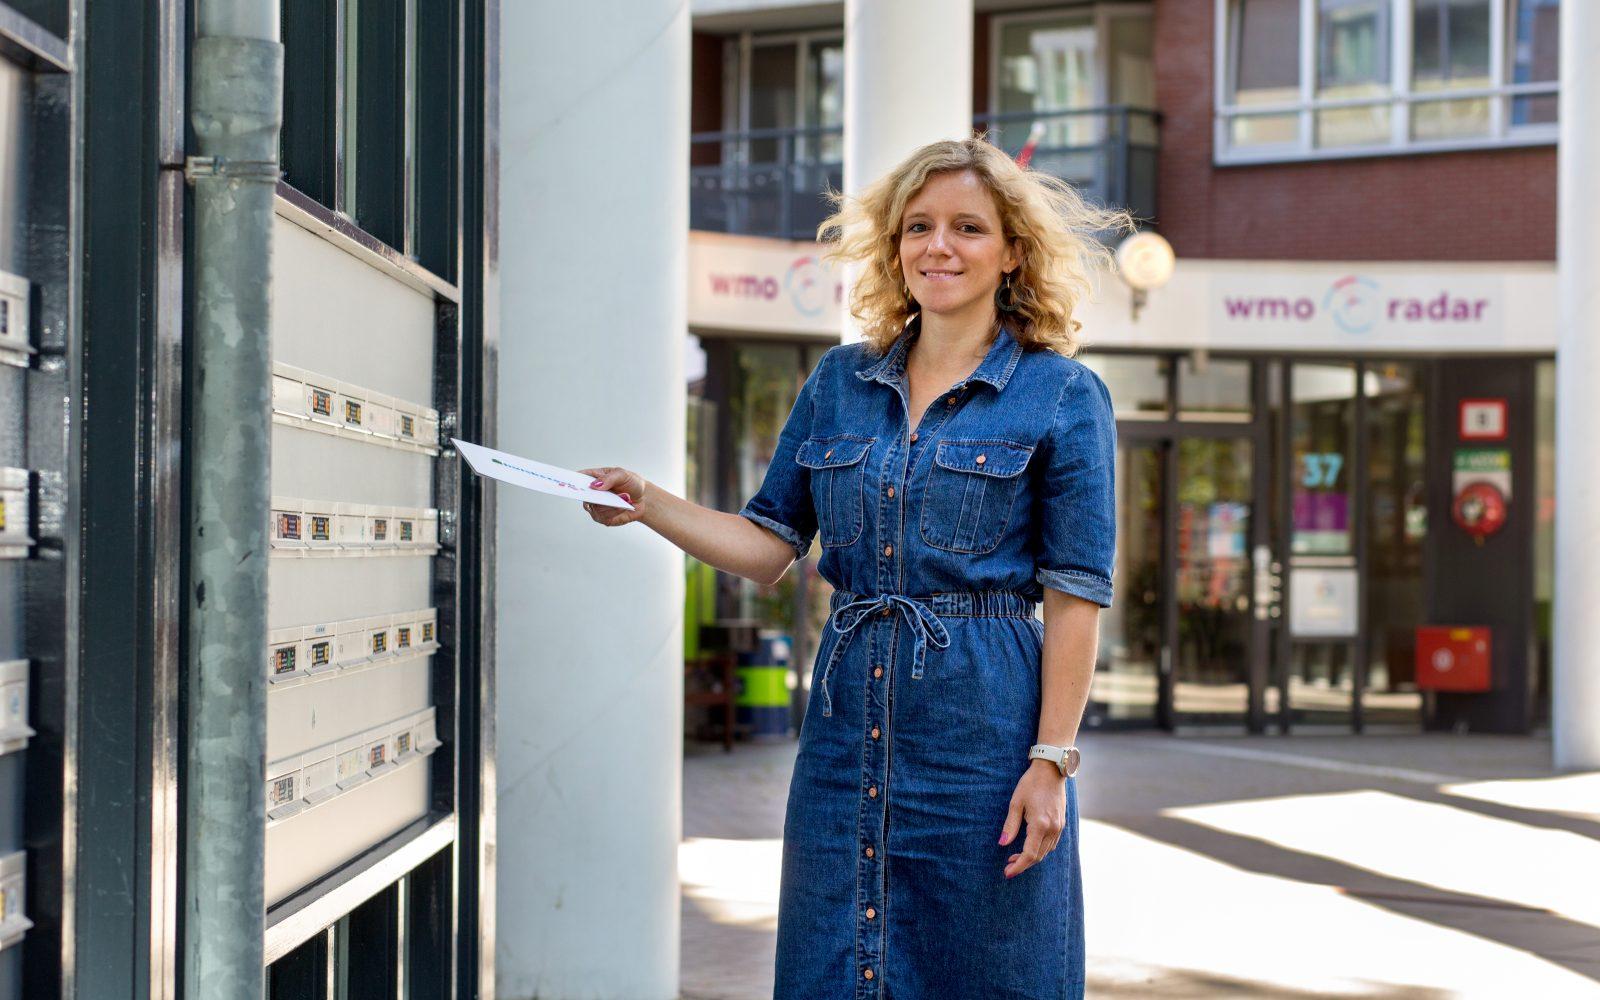 Mieke Melis van wmo radar in de Kipstraat